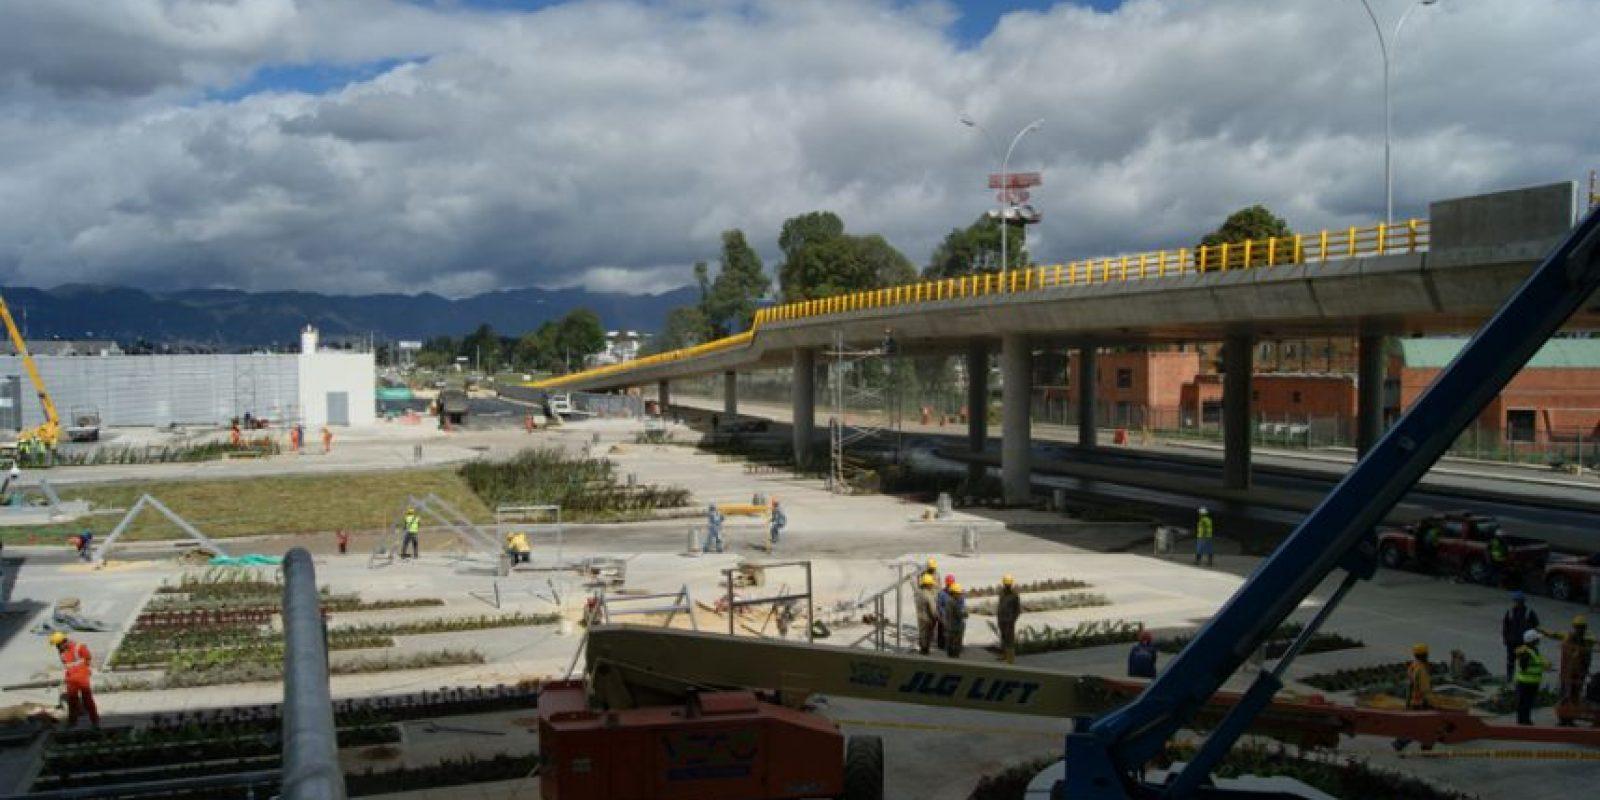 Viaducto Foto:Opain